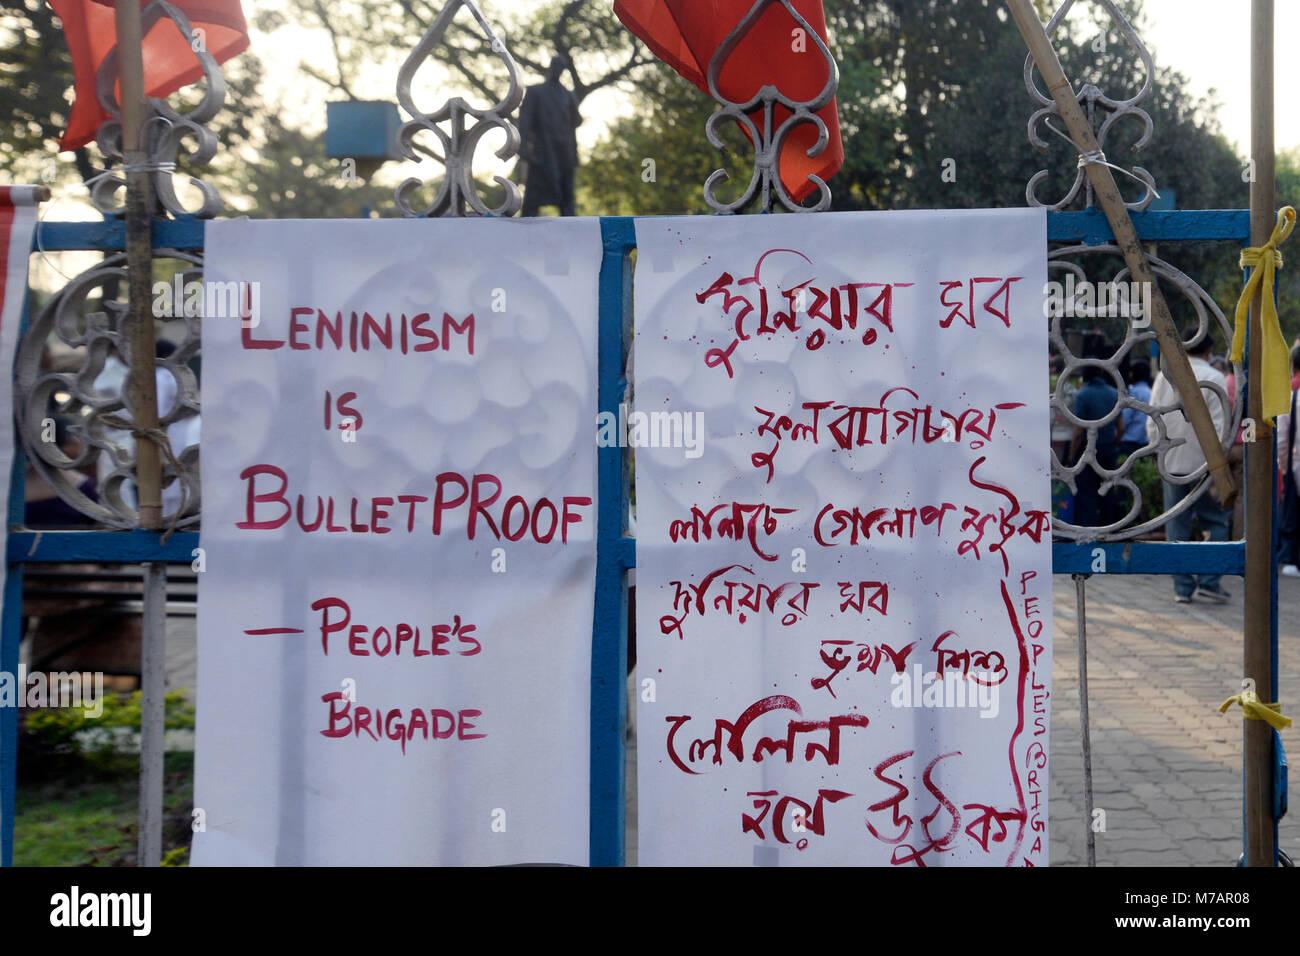 bons lieux de rencontre à Kolkata